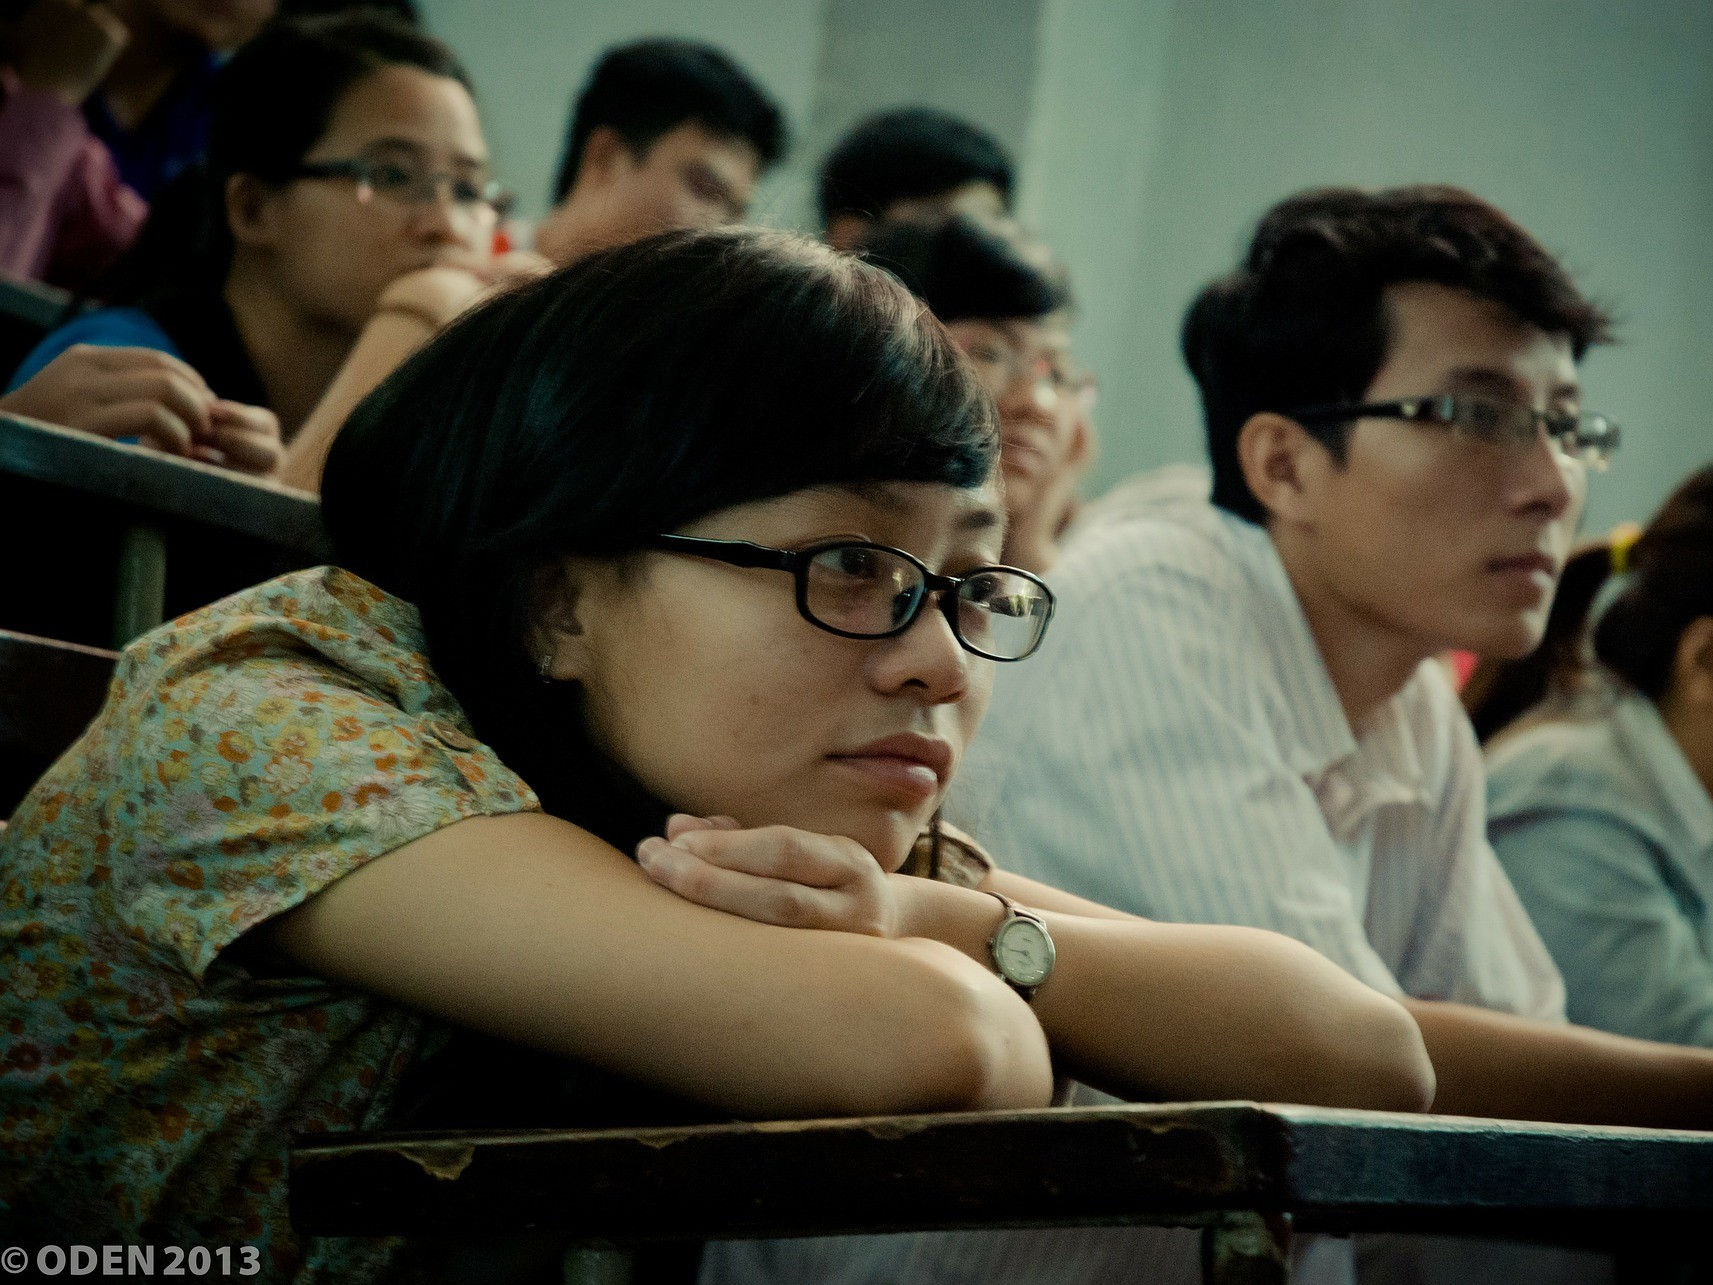 students-250164_1920-1713x1285.jpg